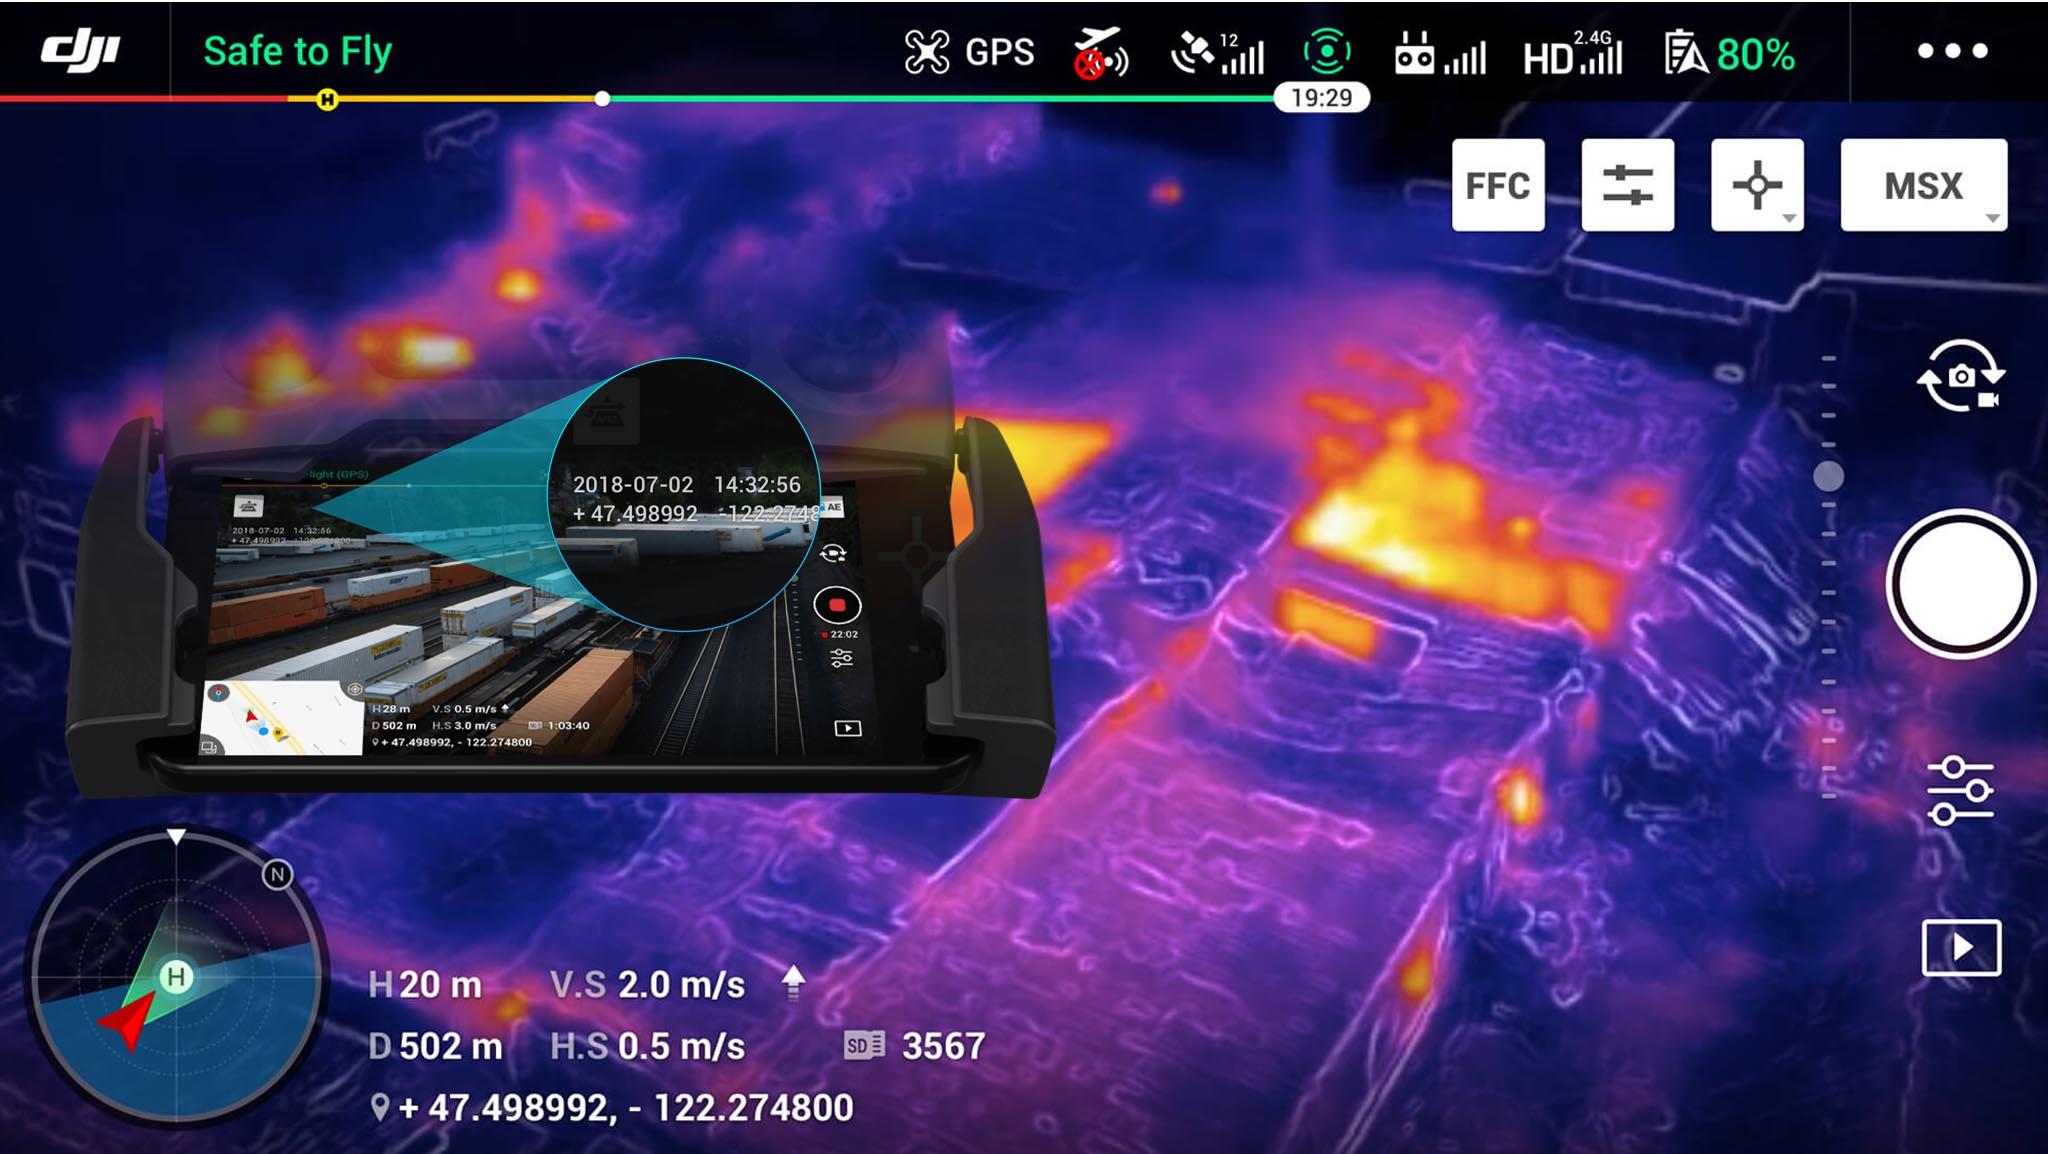 mavic2-enterprise-dual-control-remoto